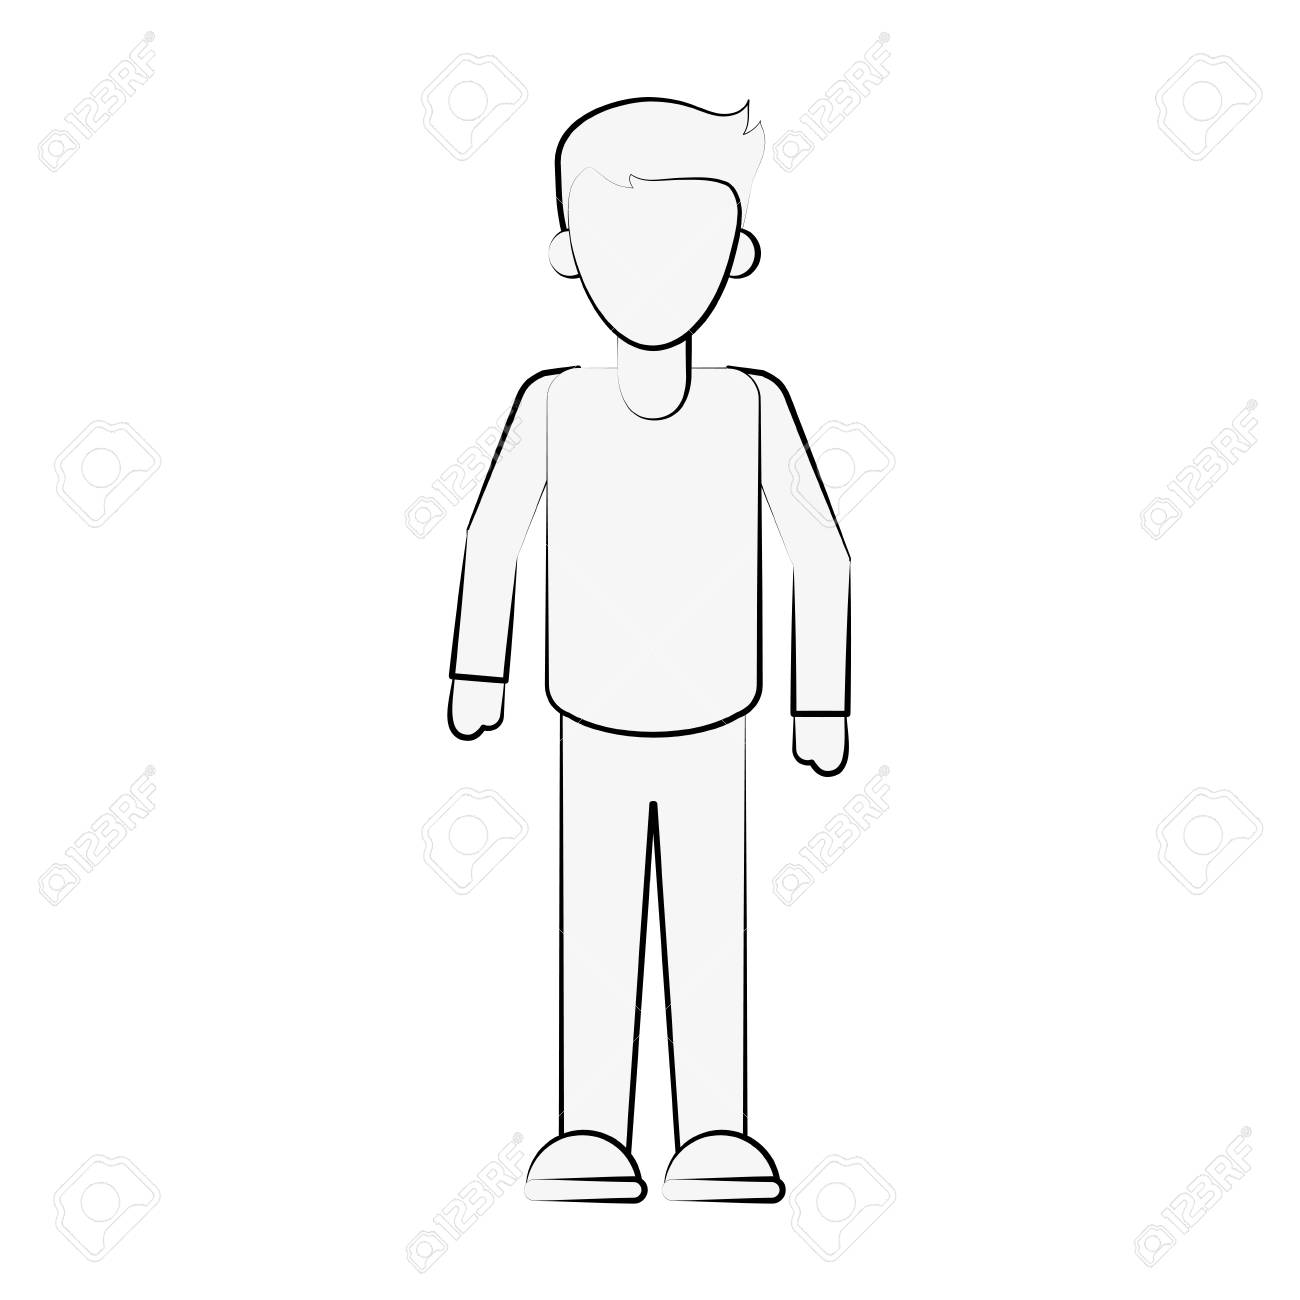 Man avatar full body icon image vector illustration design black sketch line stock vector 88887032